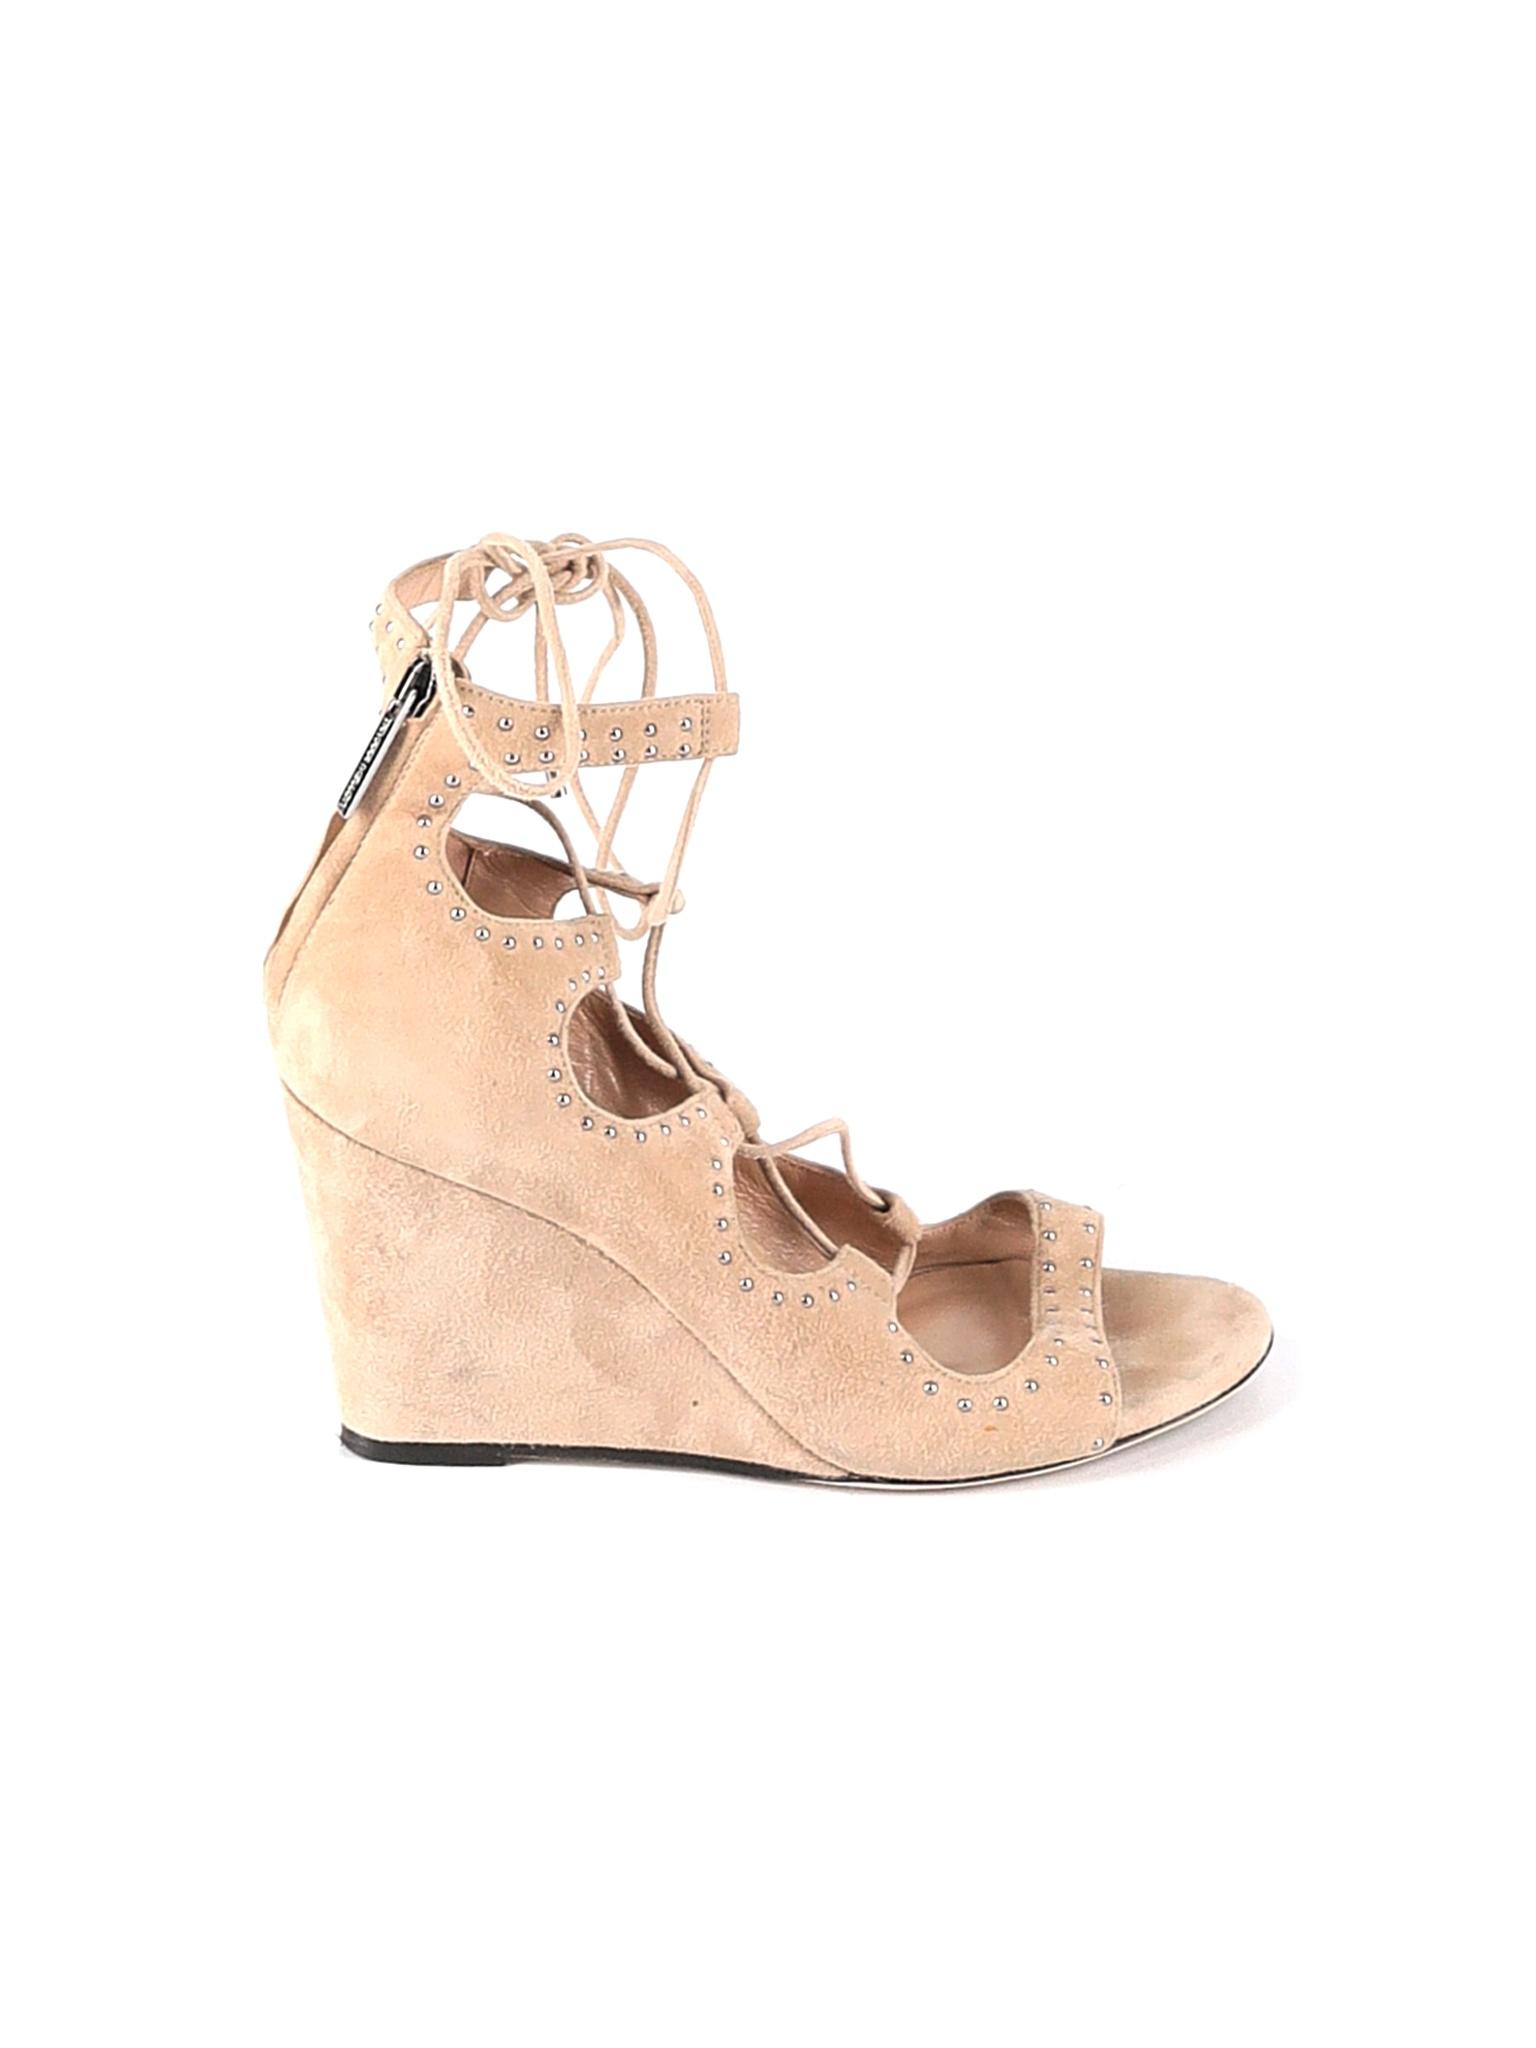 tamara mellon shoes sale